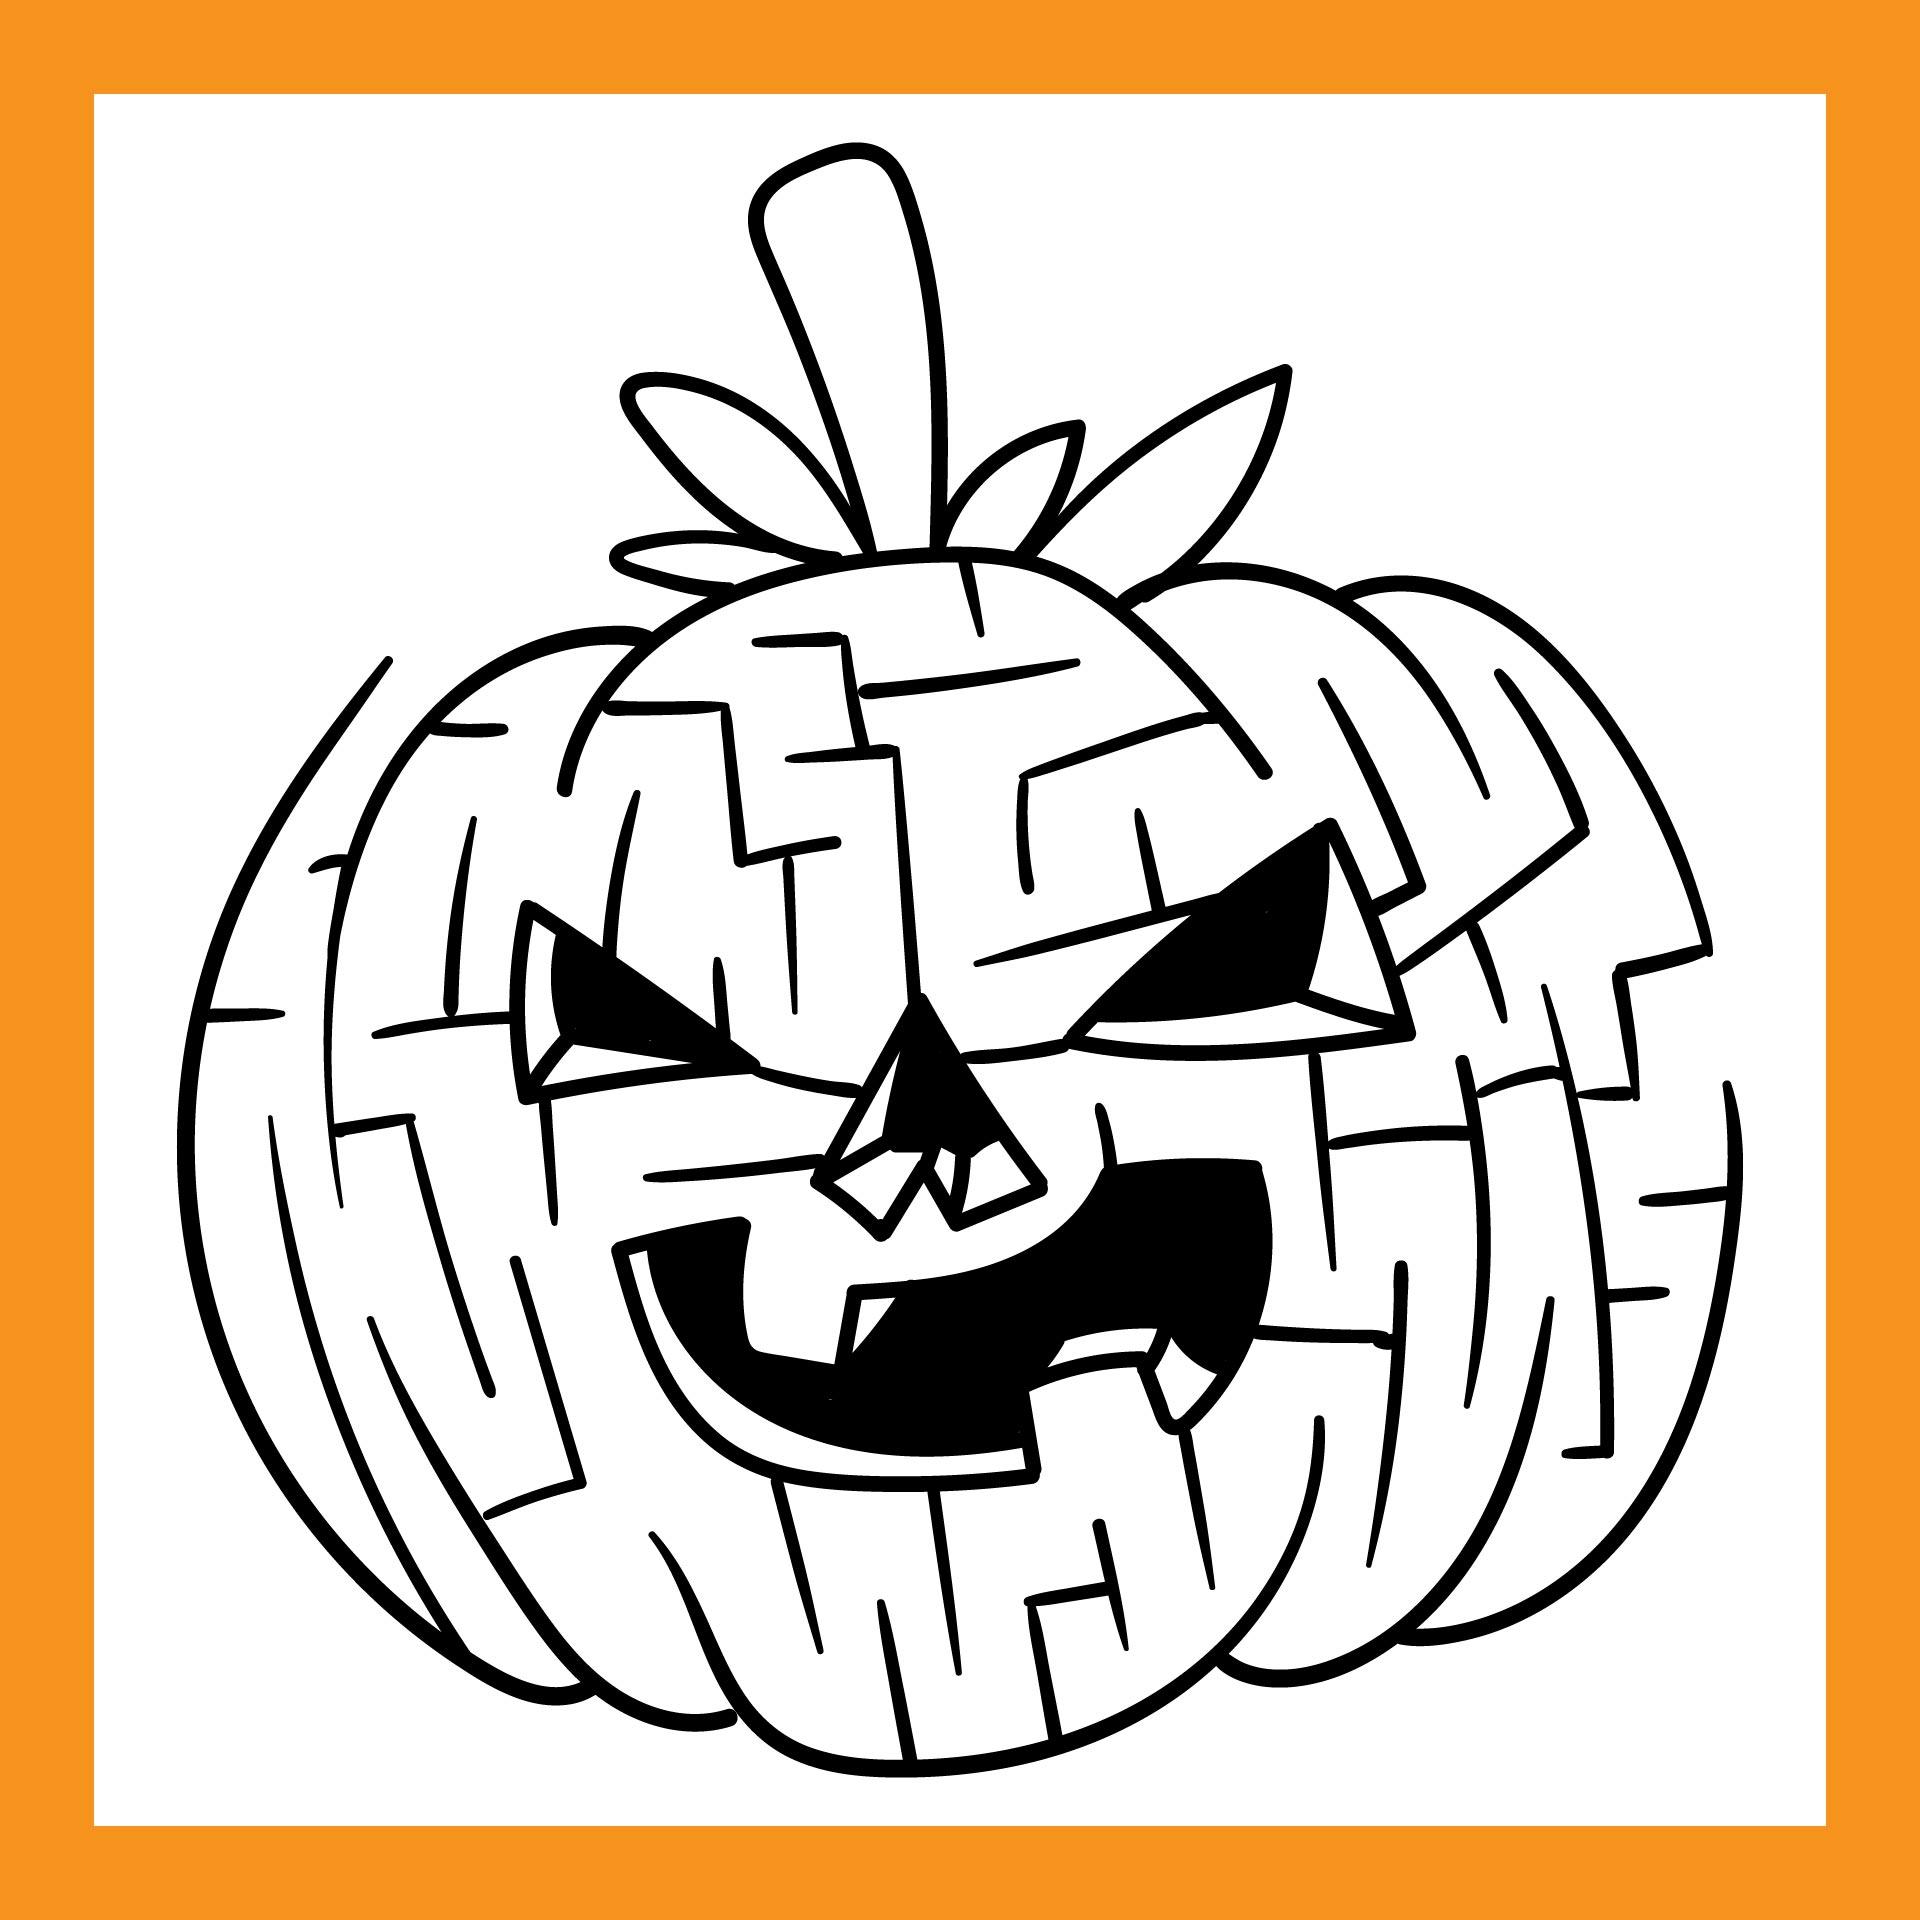 Halloween Pumpkins Labyrinth Puzzle Free Printable